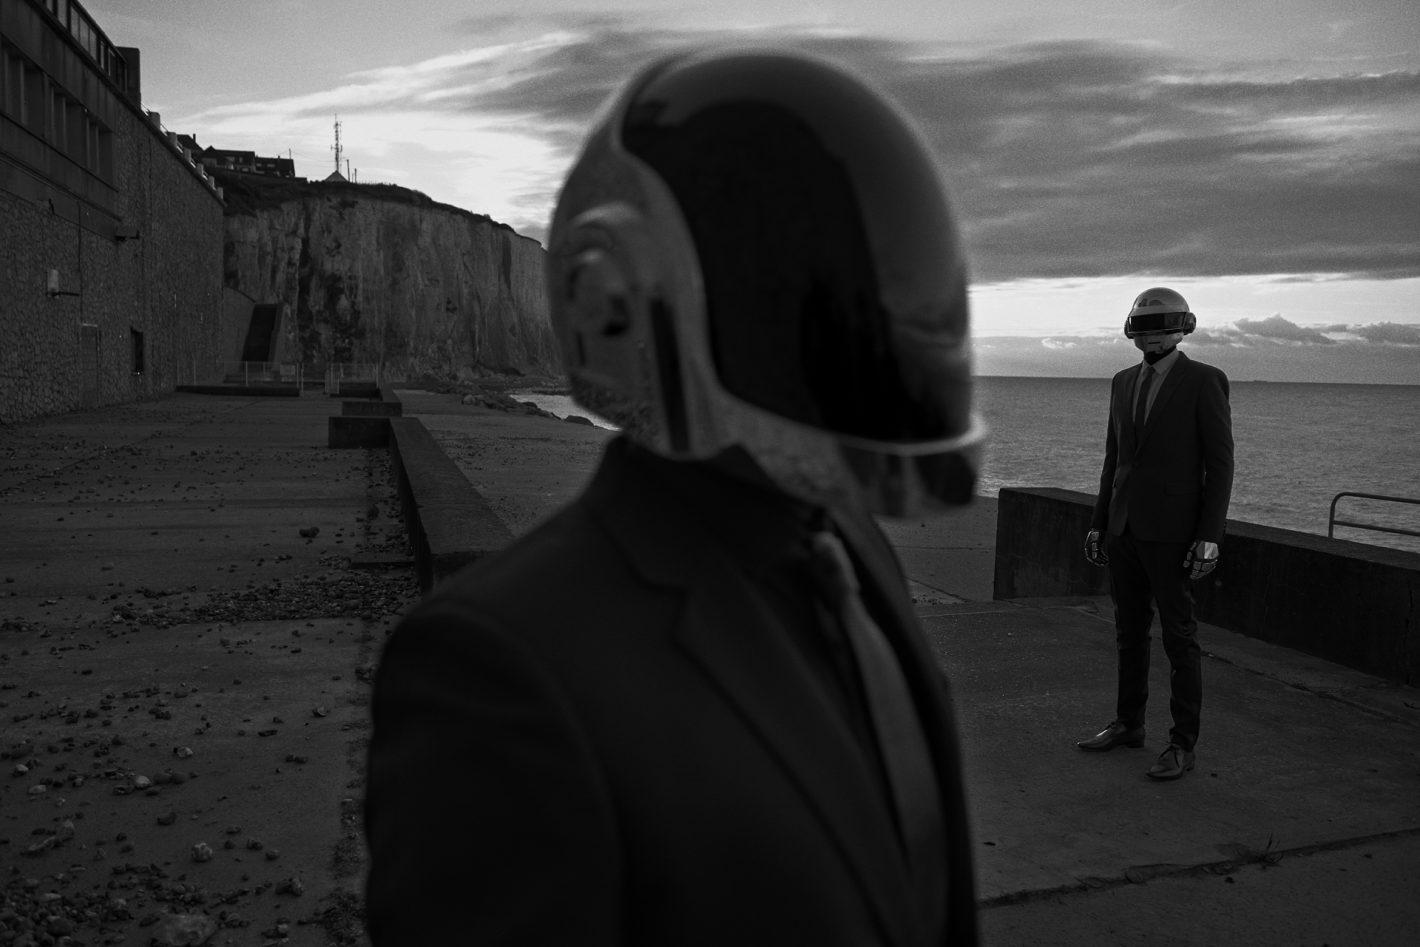 Daft Punk, Ault, France, 2013 M Le Monde © Peter Lindbergh (Courtesy of Peter Lindbergh, Paris / Gagosian Gallery), Hedi Slimane for Saint Laurent, F/W 2013-2014